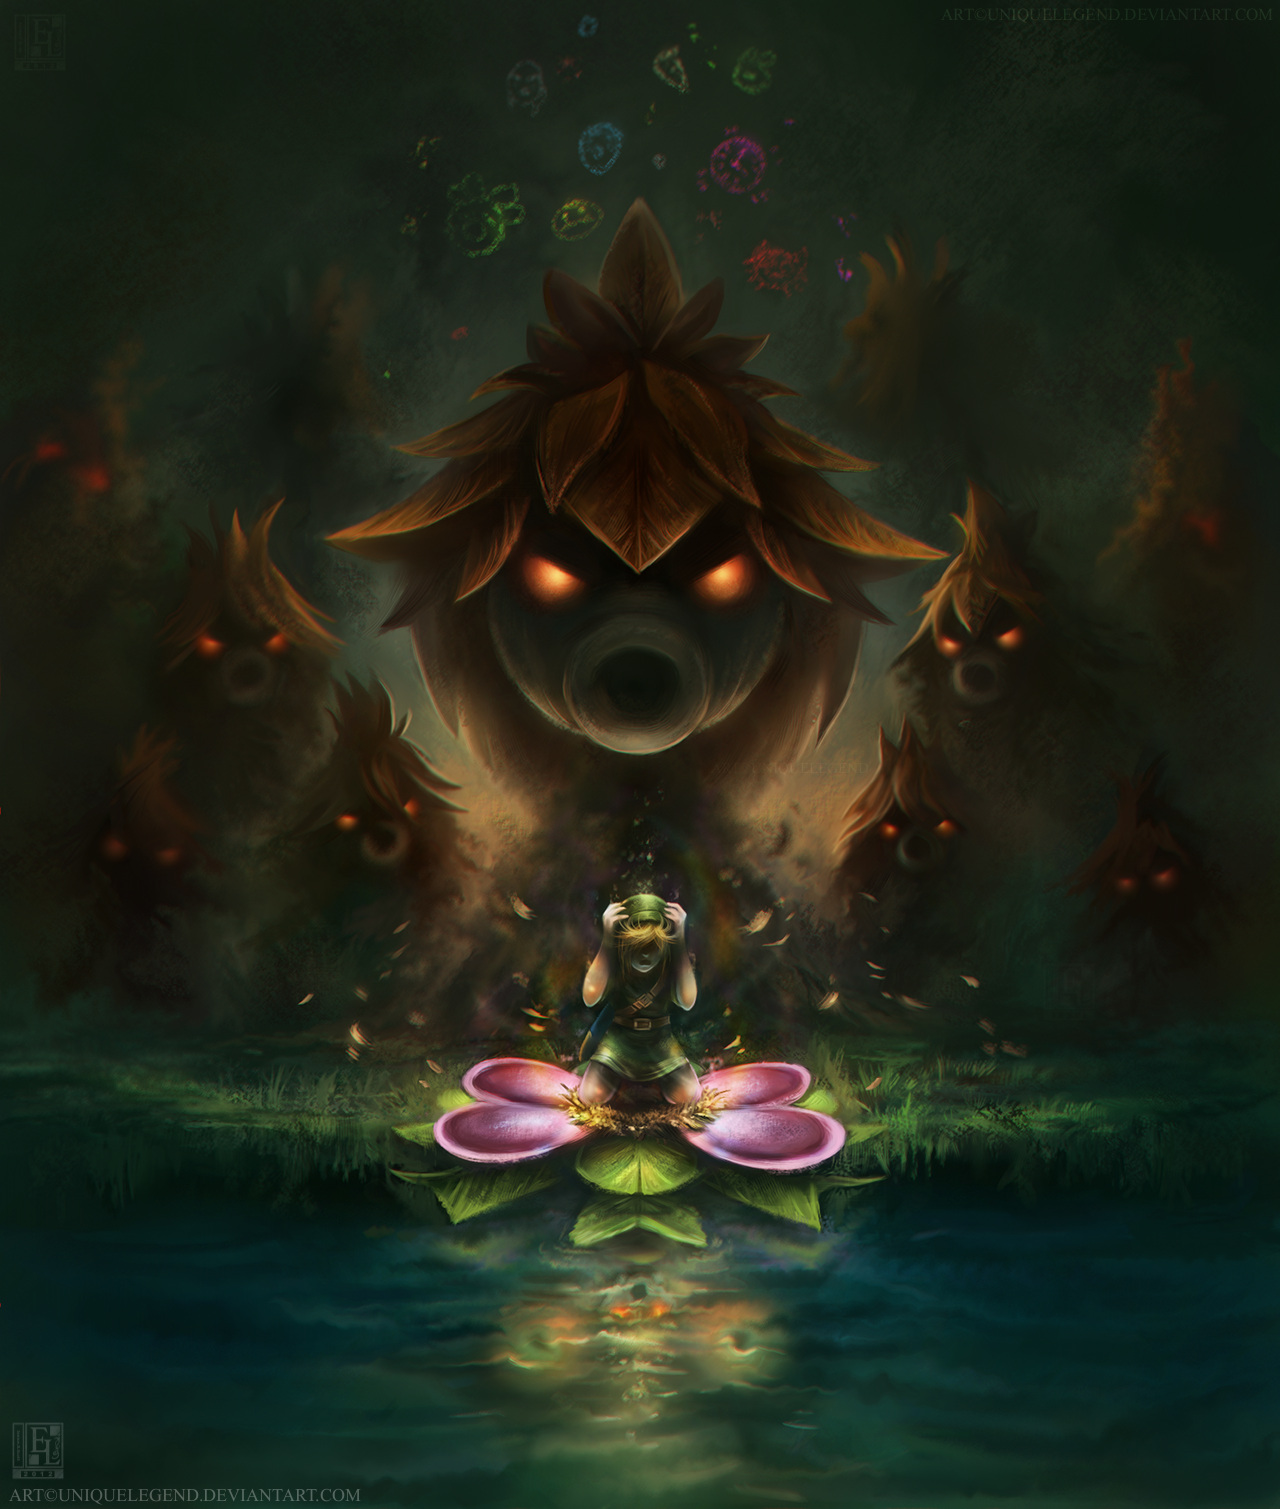 Majora's Mask: The Transformation